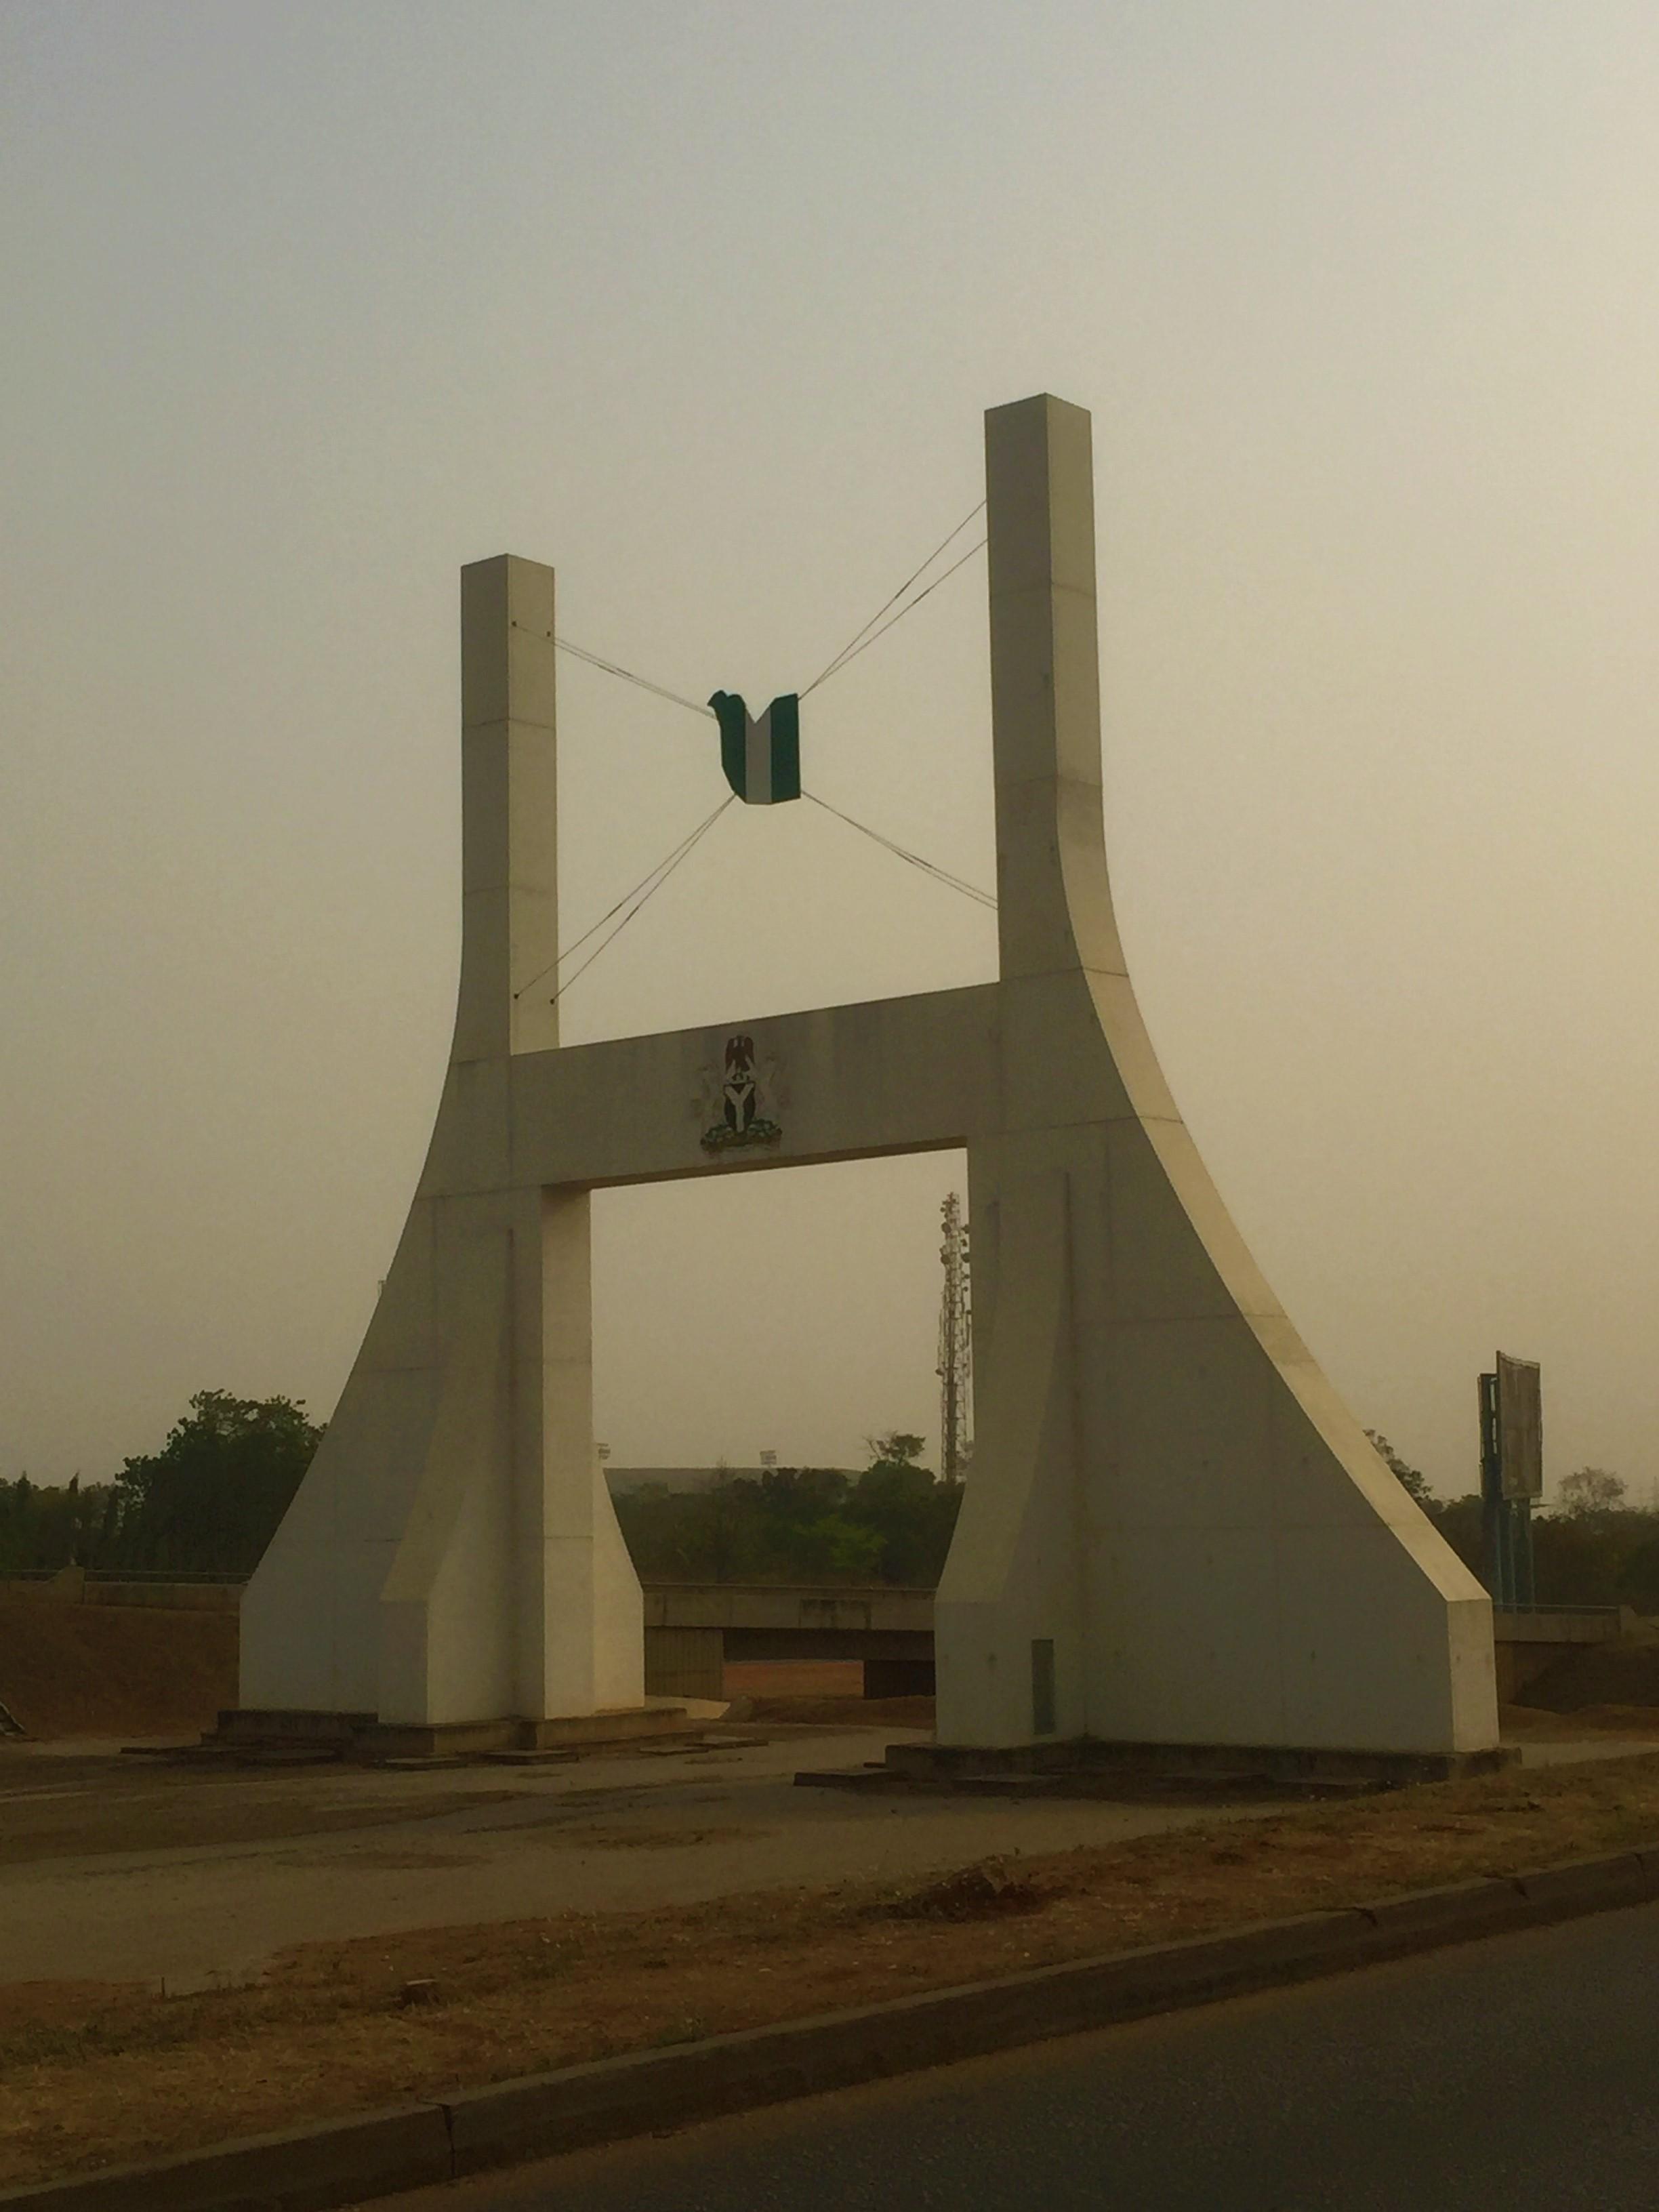 FEDERAL CAPITAL TERRITORY OF NIGERIA